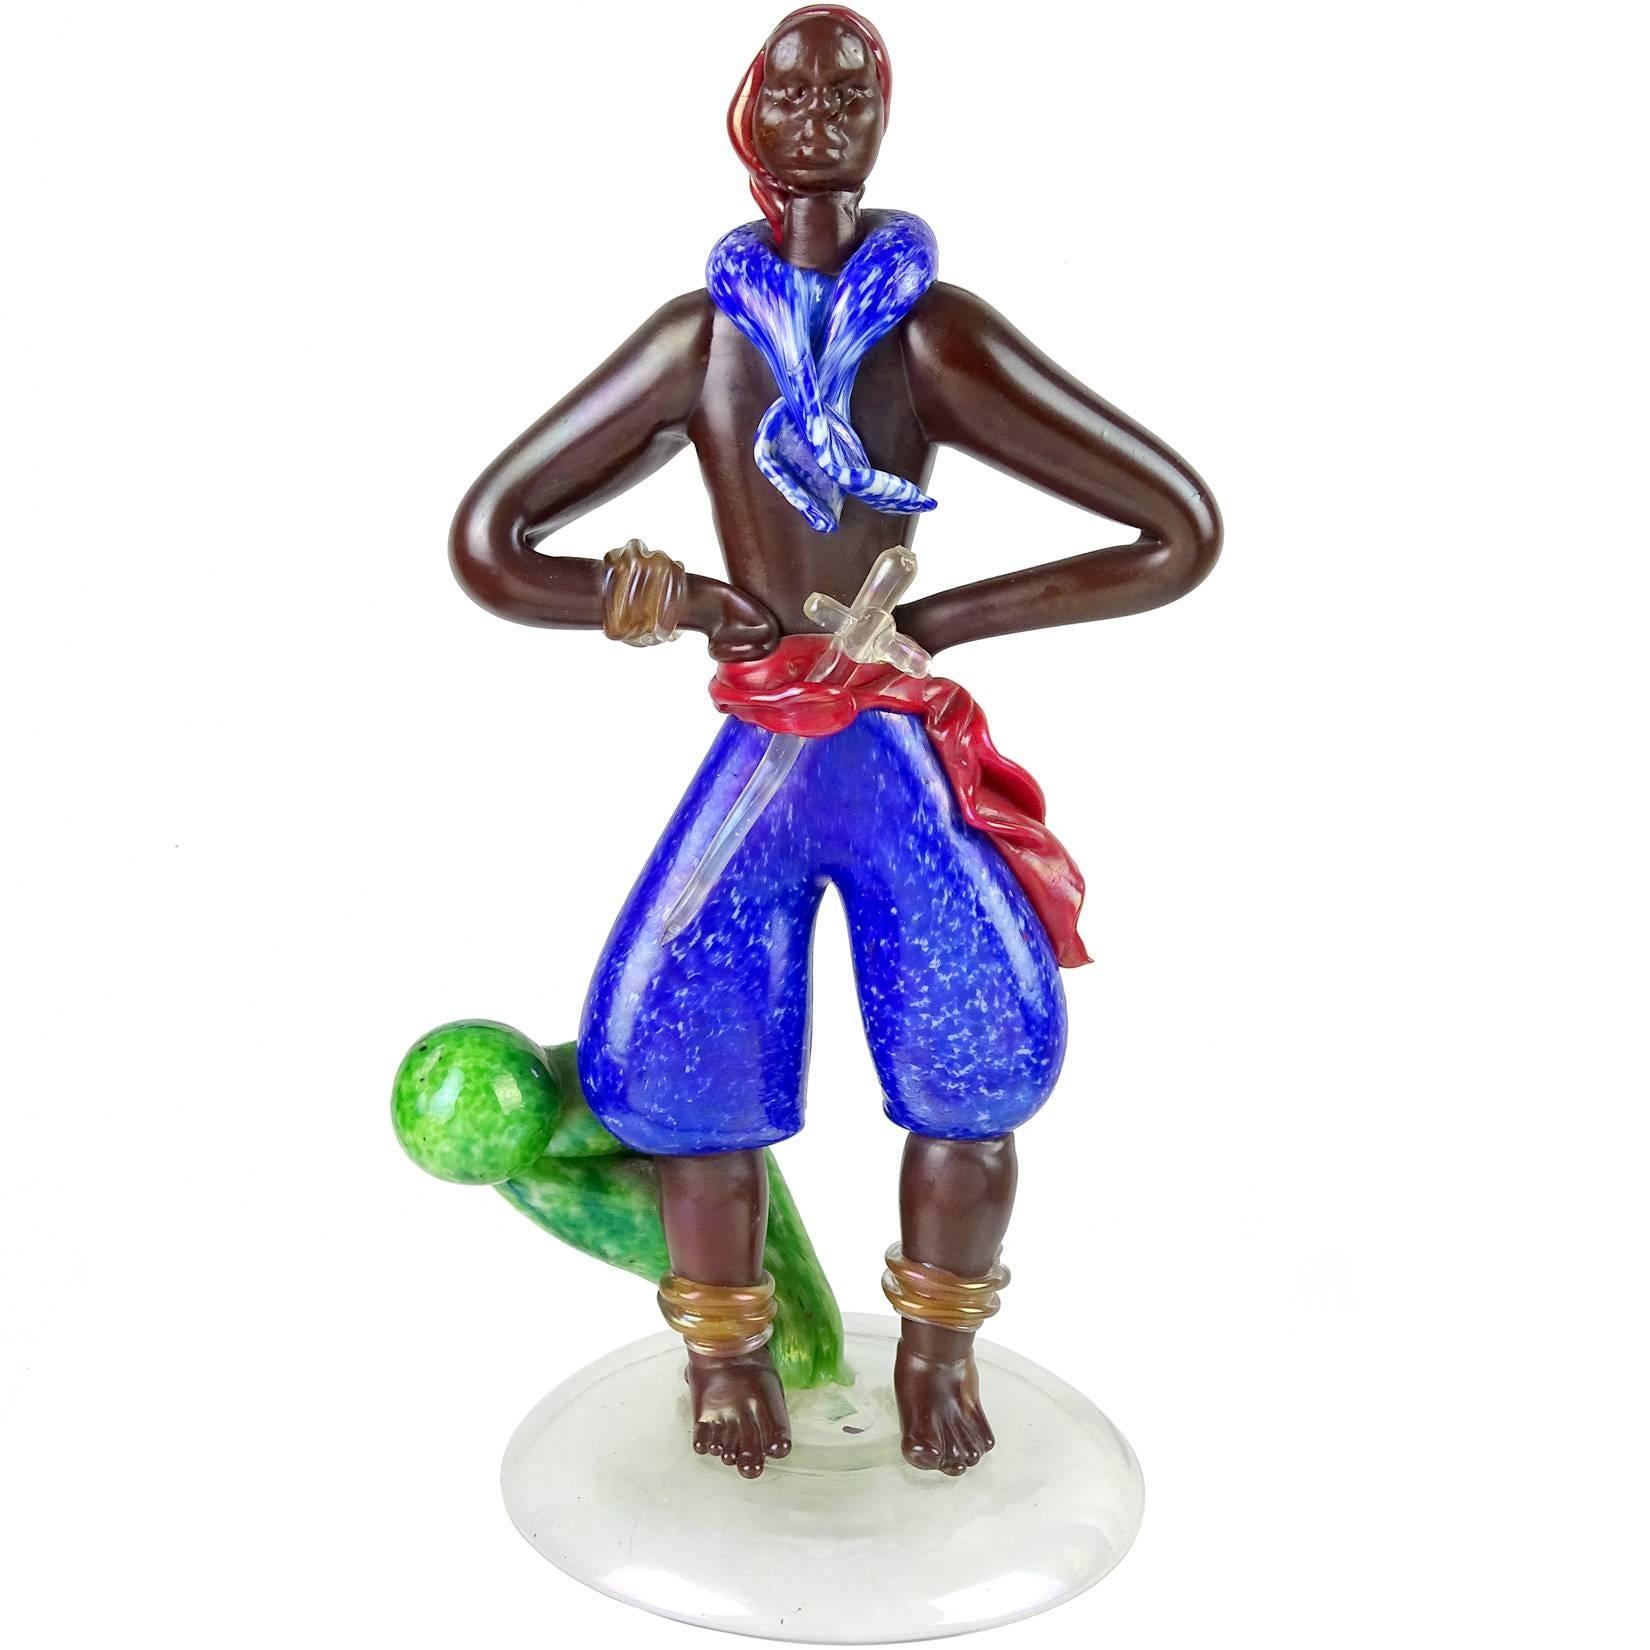 Barovier Seguso Ferro Murano Iridescent Italian Art Glass Pirate Sculpture